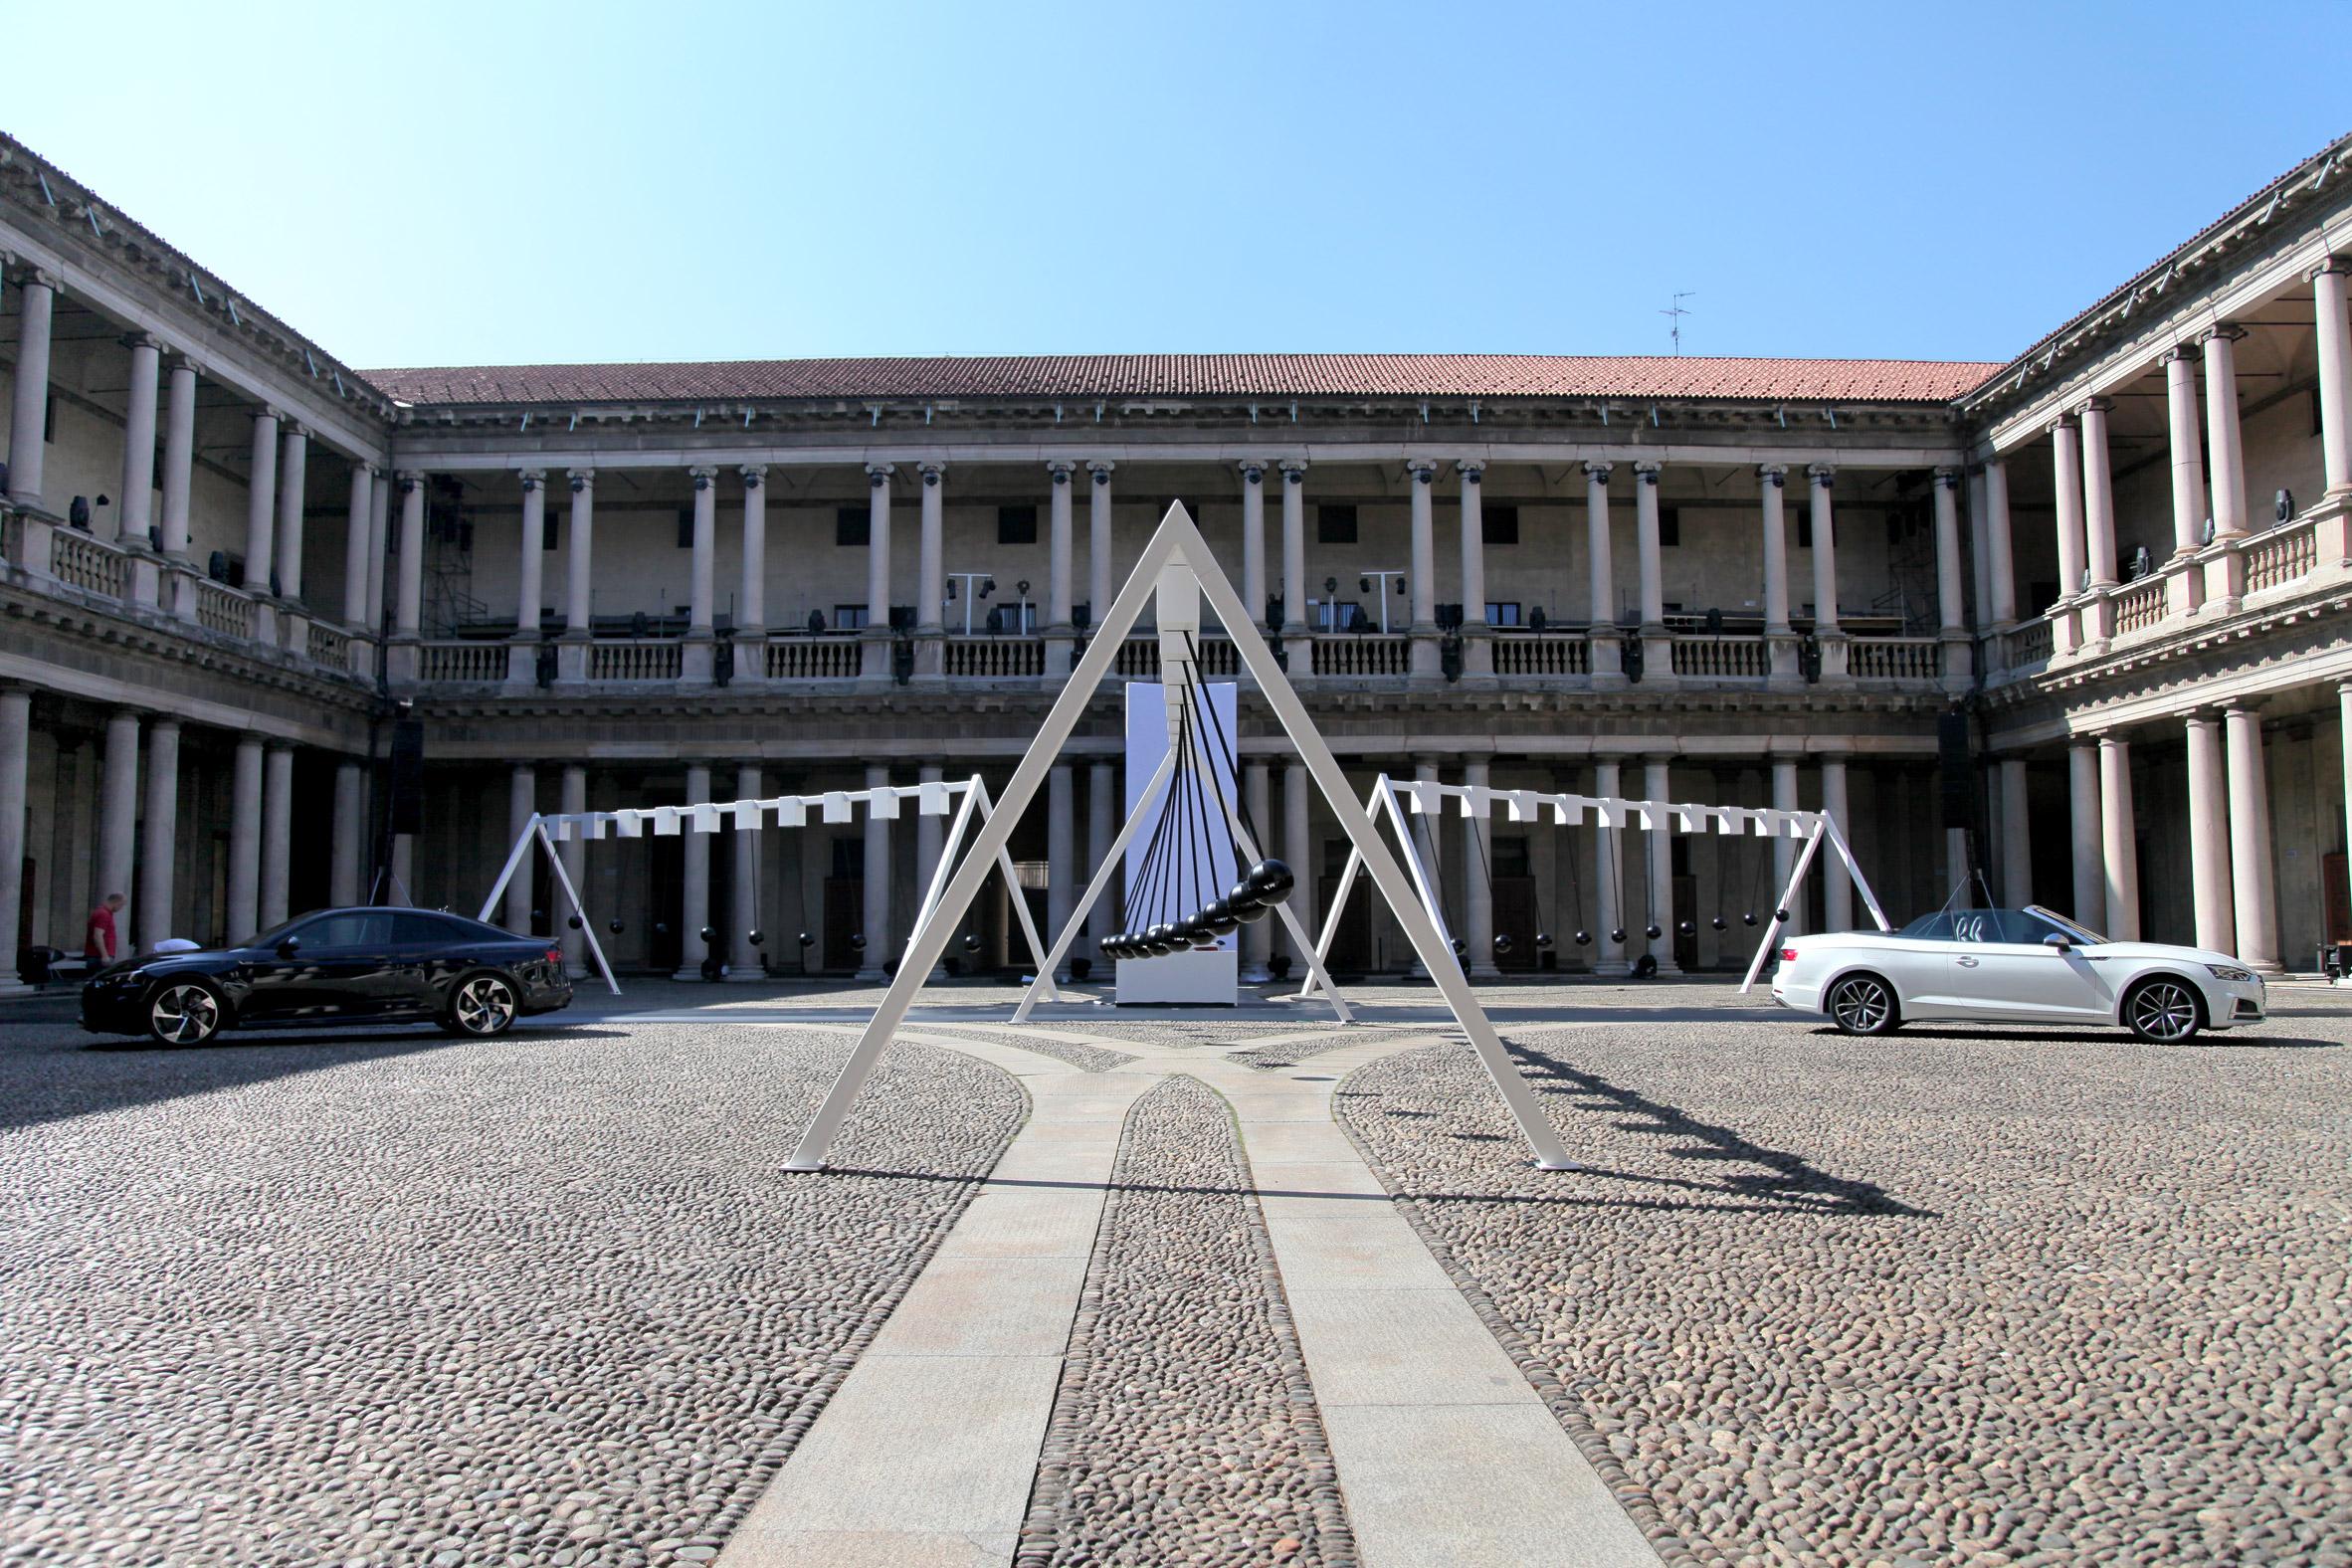 Yuri Suzuki installs giant pendulums in courtyard of Milanese seminary